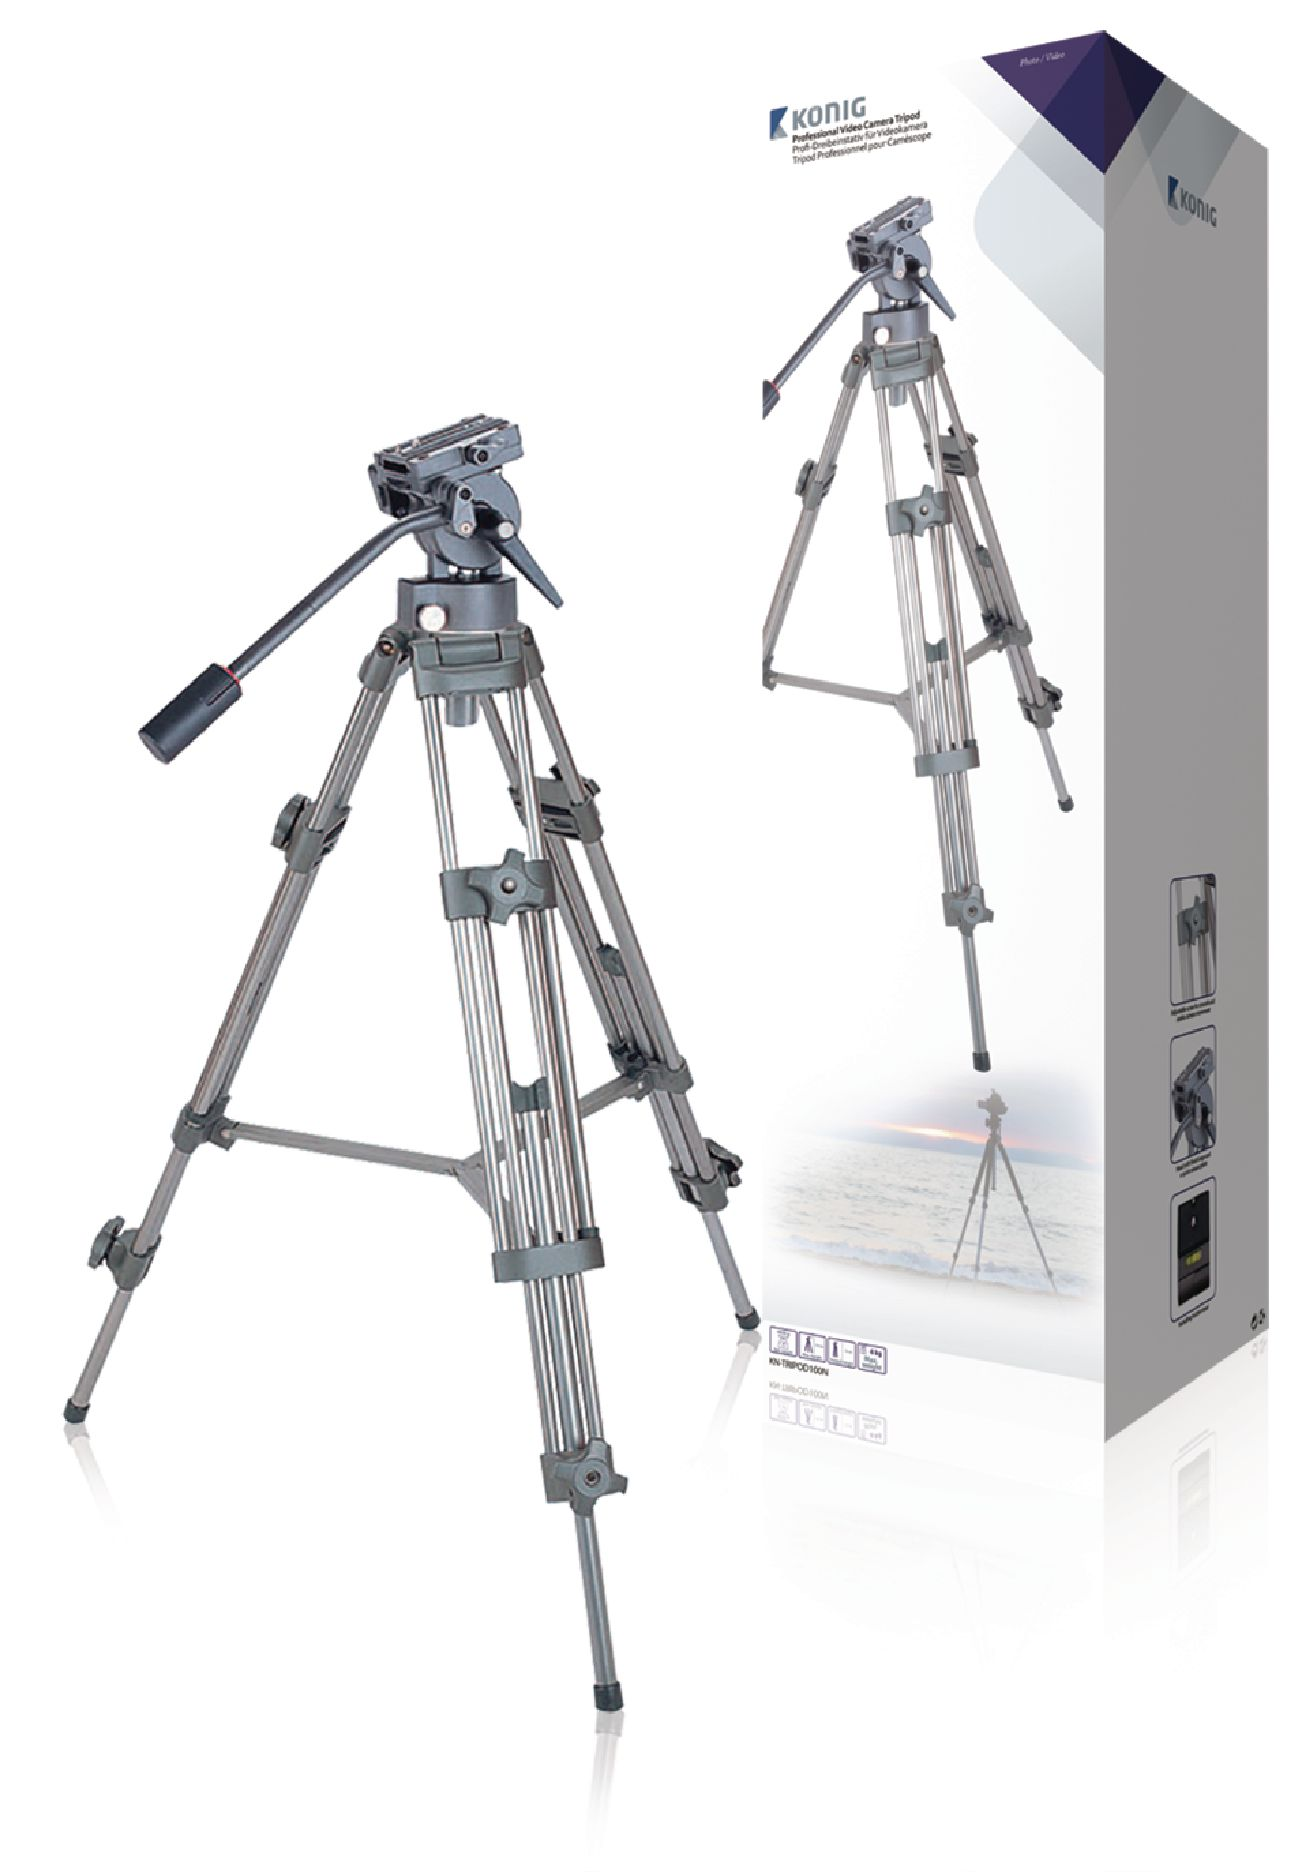 Video stativ vipbar, 137 cm. sort/sølv